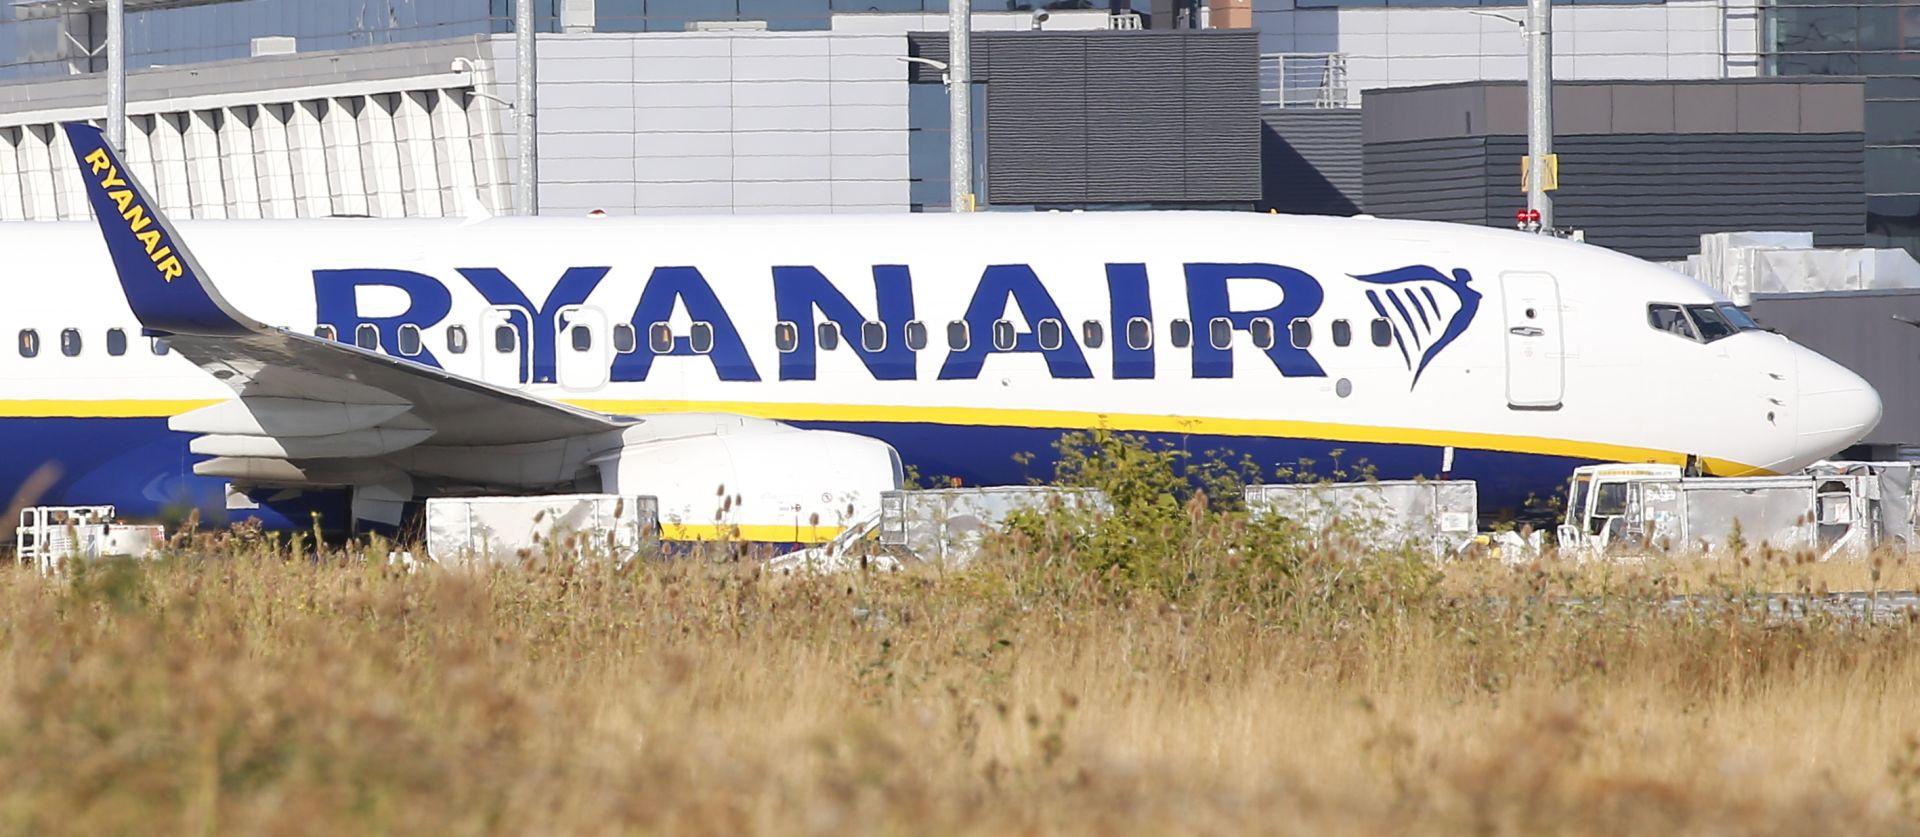 Štrajk Ryanairovih pilota izazvao kaos na vrhuncu sezone